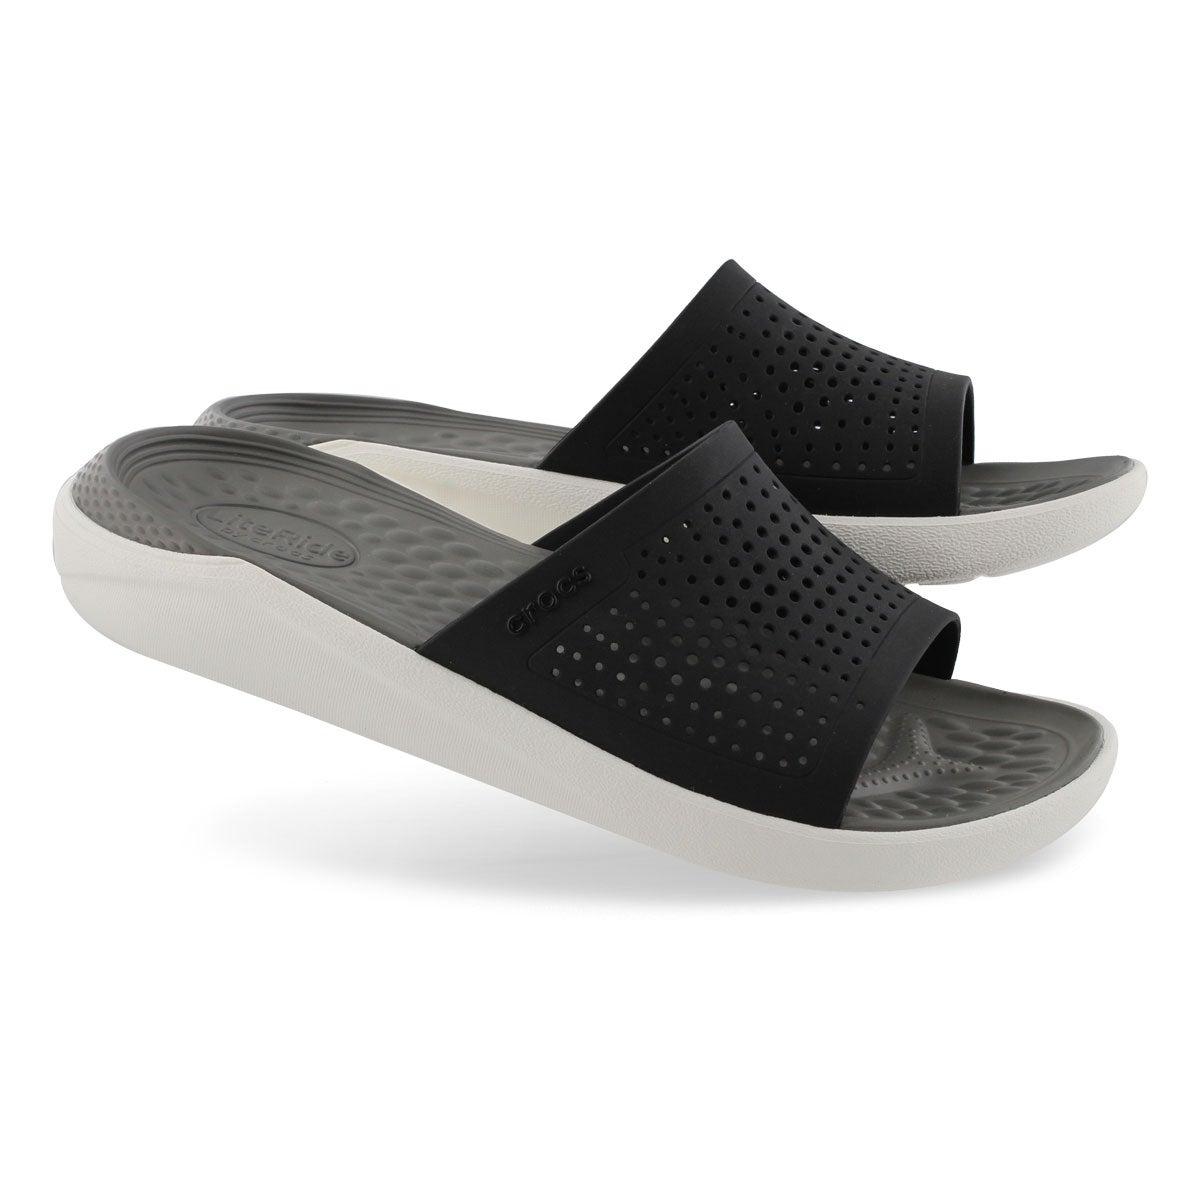 Mns LiteRide blk/smoke slide sandal